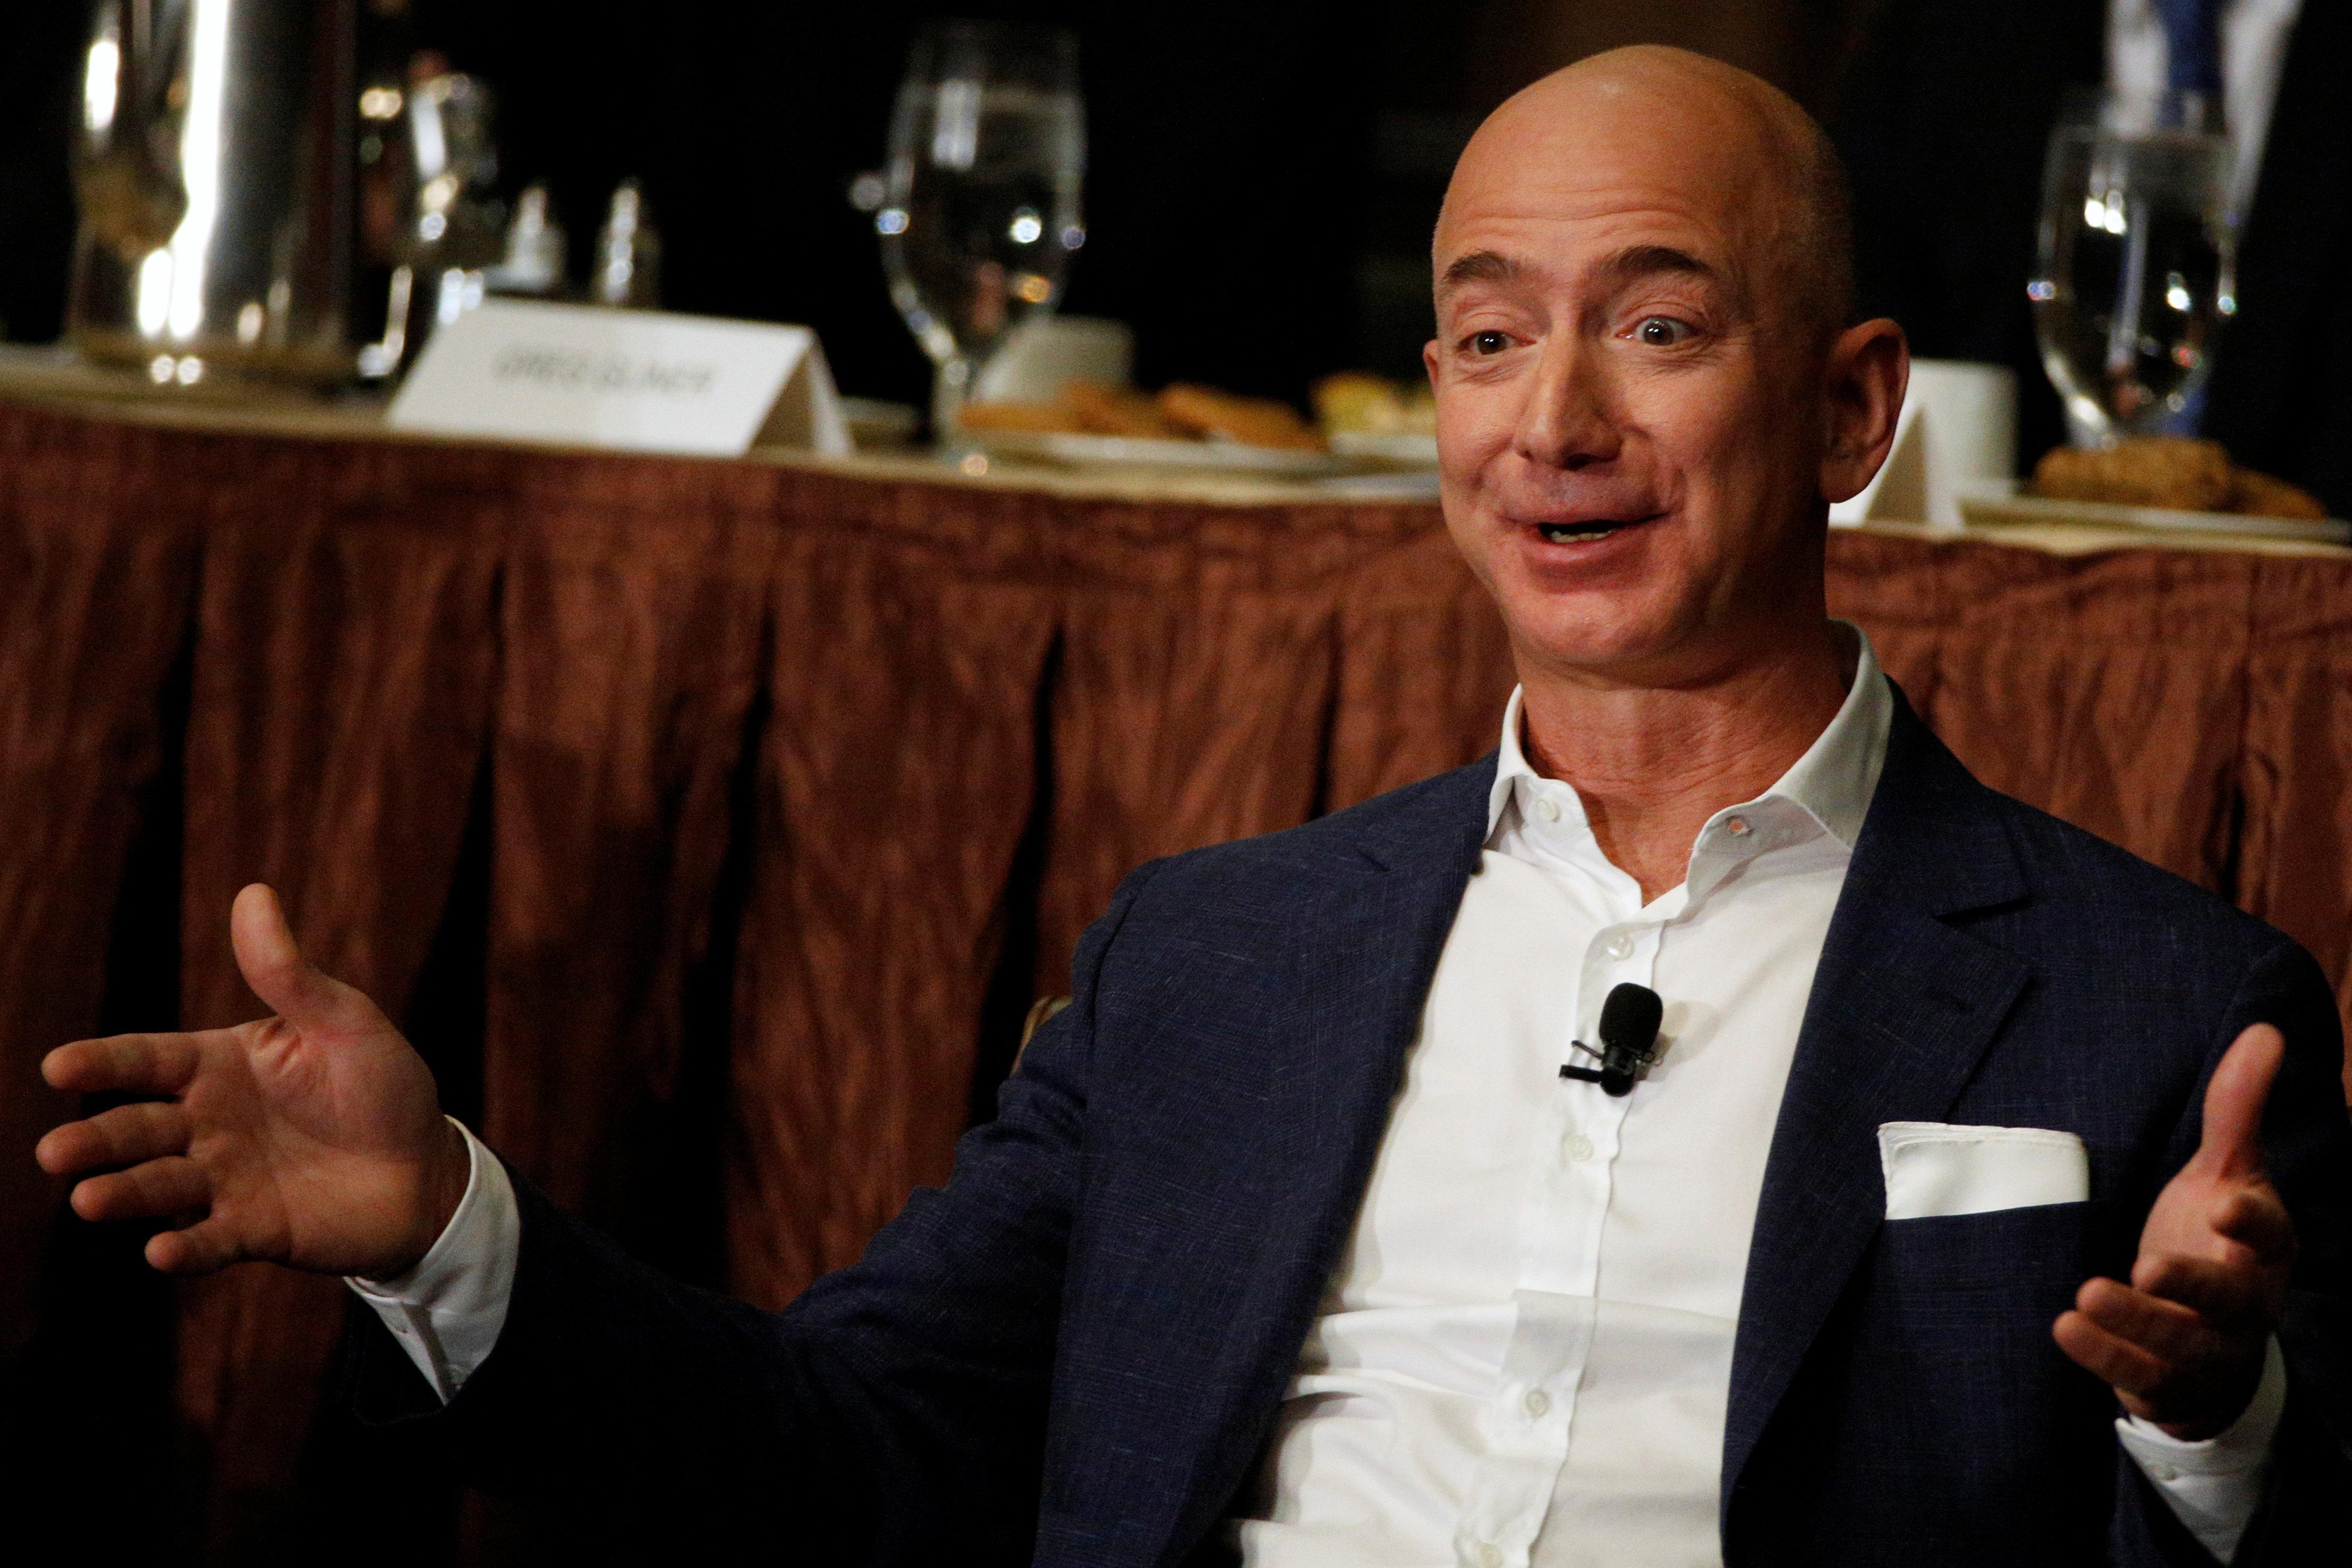 Jeff Bezos Is No Longer 'World's Richest Man' As Amazon Stock Drops